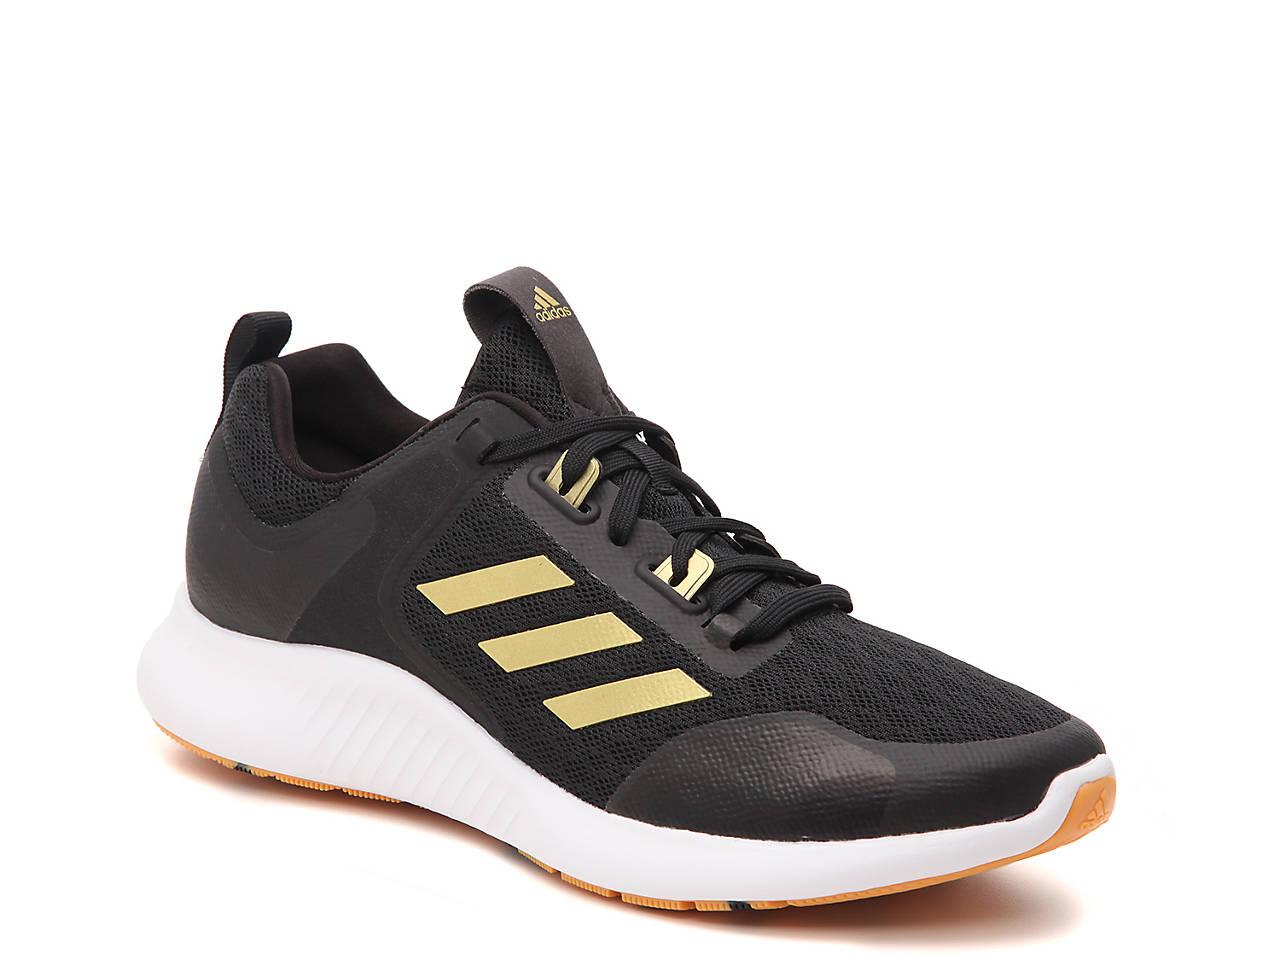 lower price with 35c20 6e99e Edgebounce 1.5 Lightweight Running Shoe - Women's